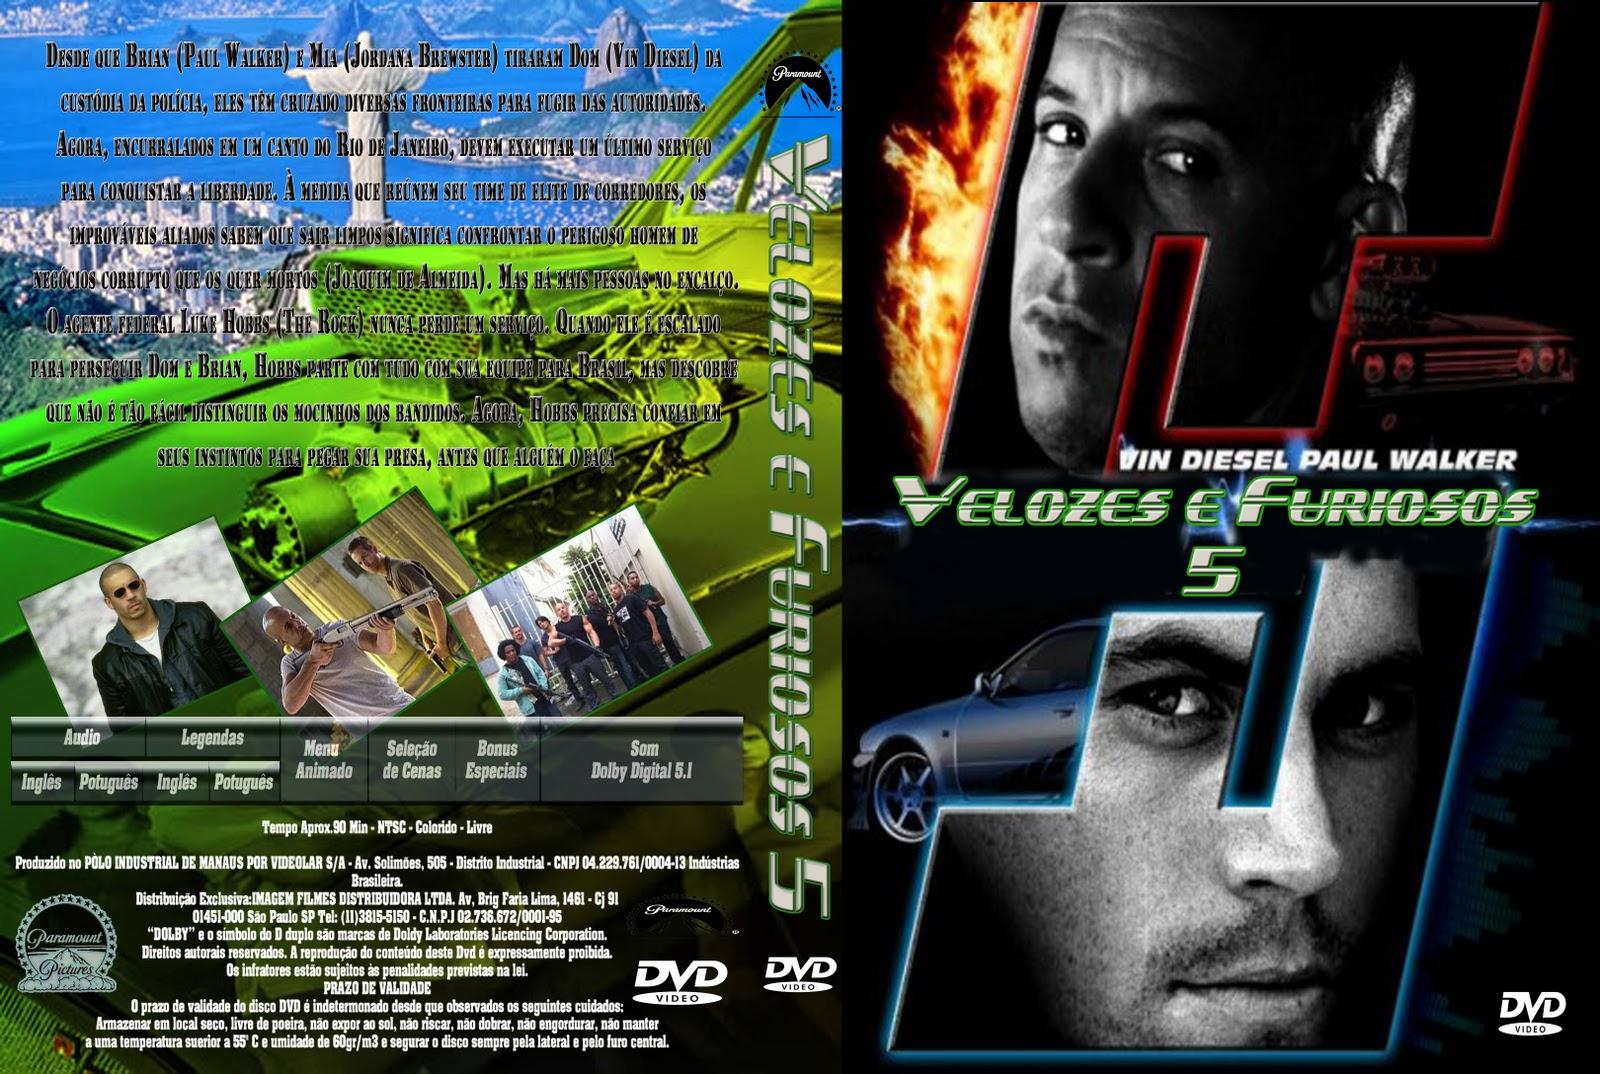 http://2.bp.blogspot.com/-qh8a9K19x4M/TchHStj8SqI/AAAAAAAAAjk/W2YJqnaYmLA/s1600/Velozes_e_Furiosos_5_capa1.jpg